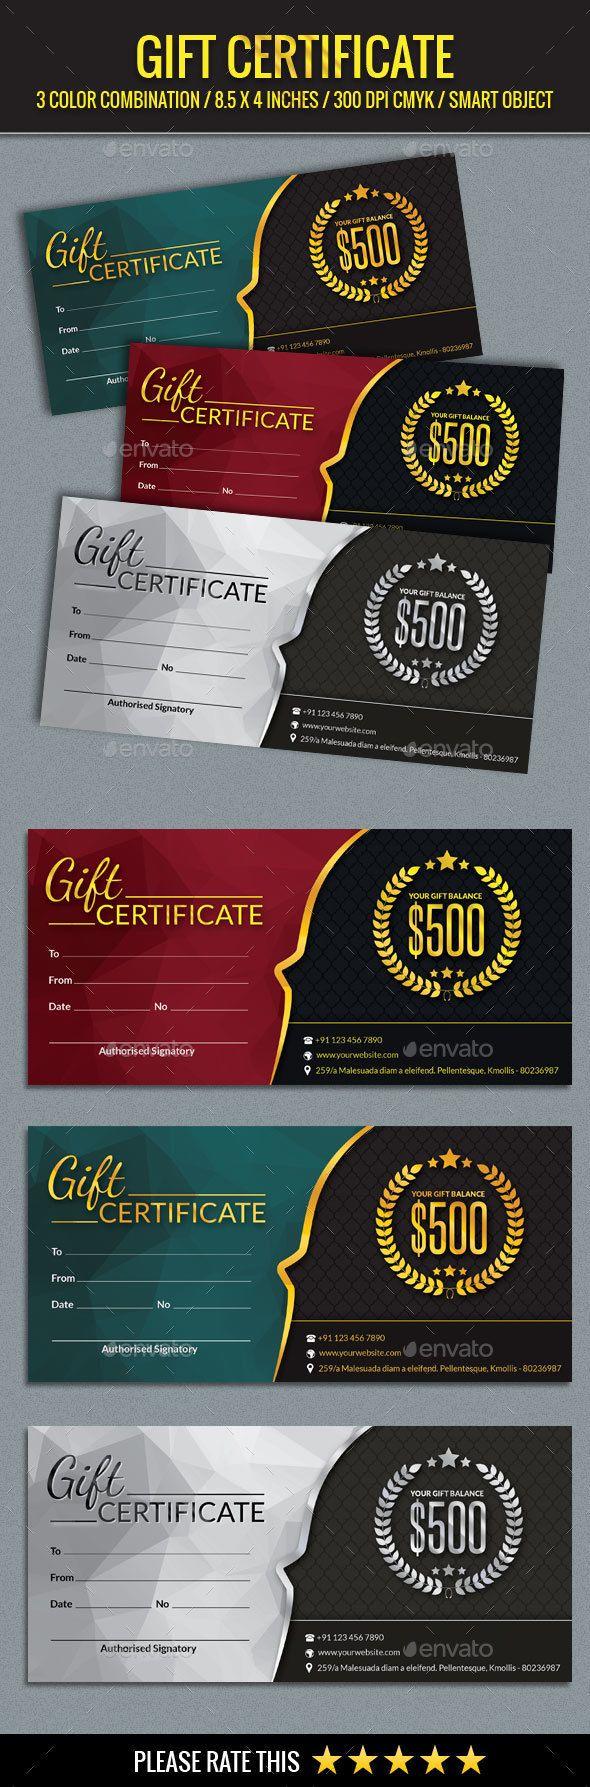 Certificate 90 pinterest gift certificate template yelopaper Gallery